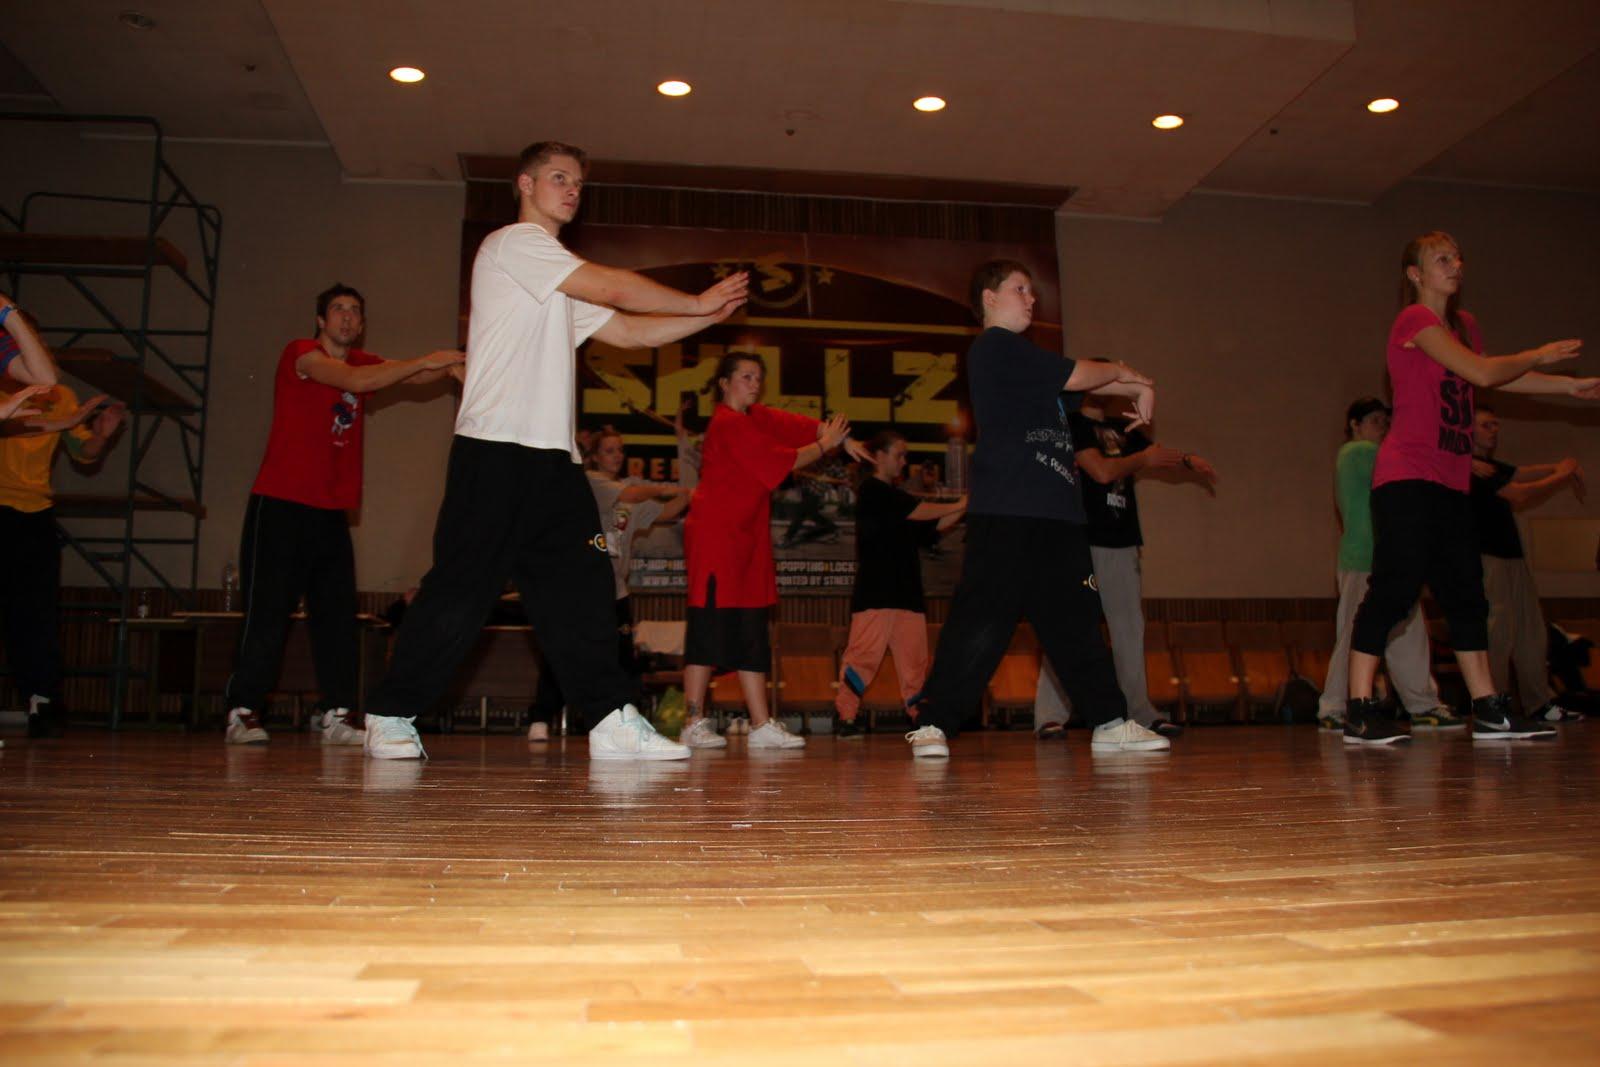 Dre10 Workshop @SKILLZ - IMG_5708.JPG